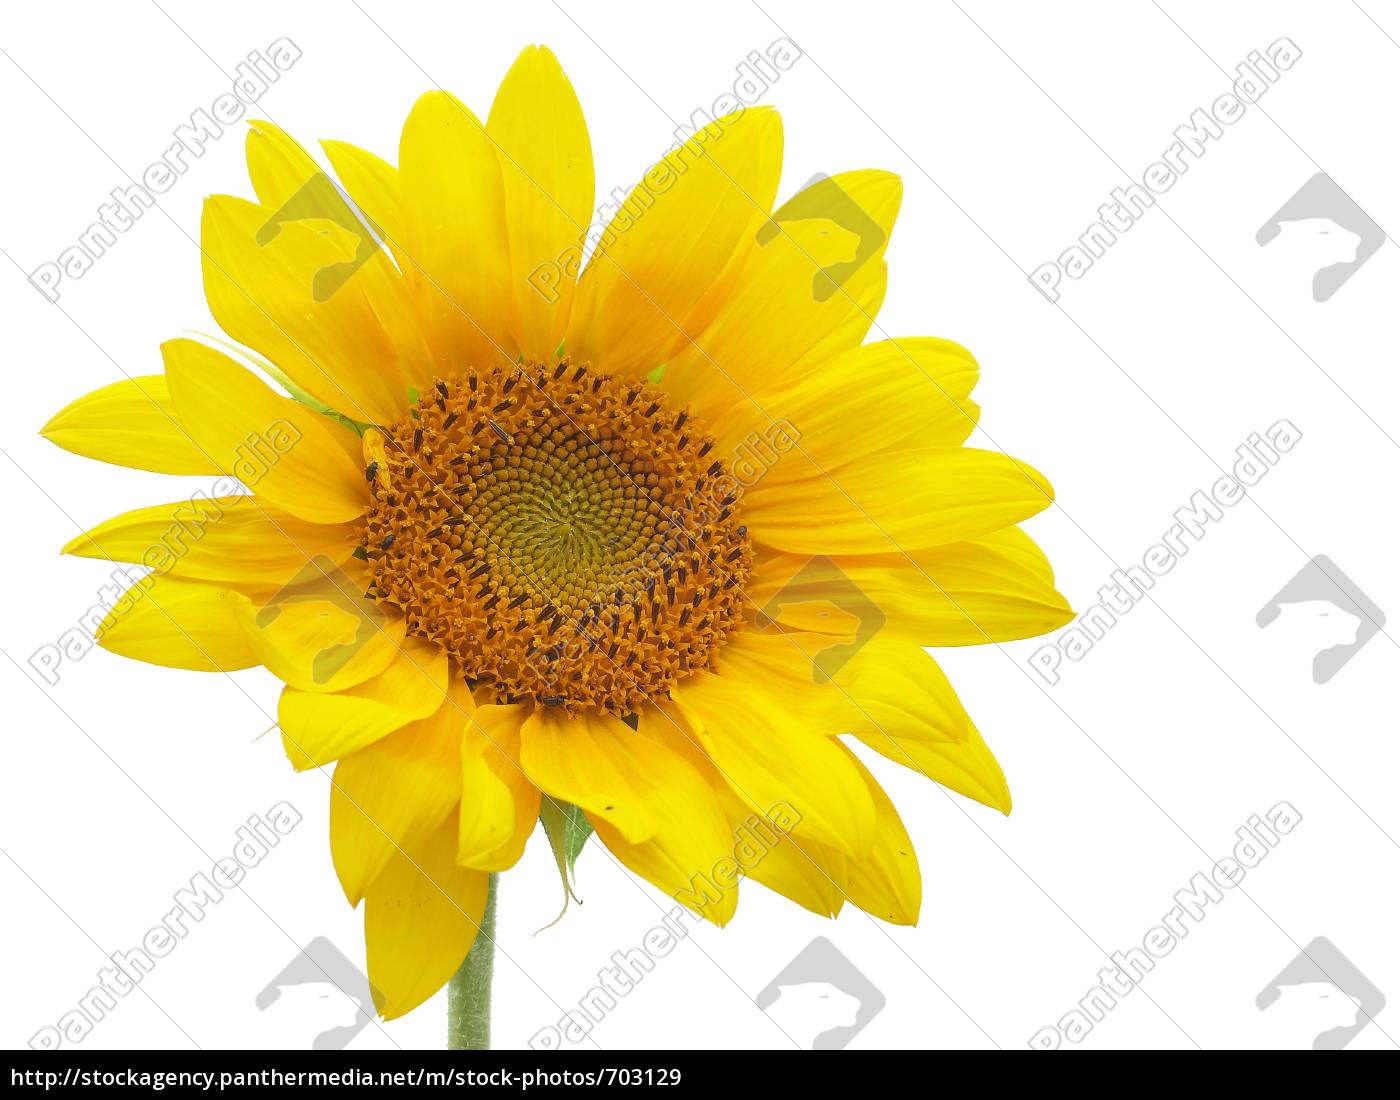 isolated, sunflower - 703129